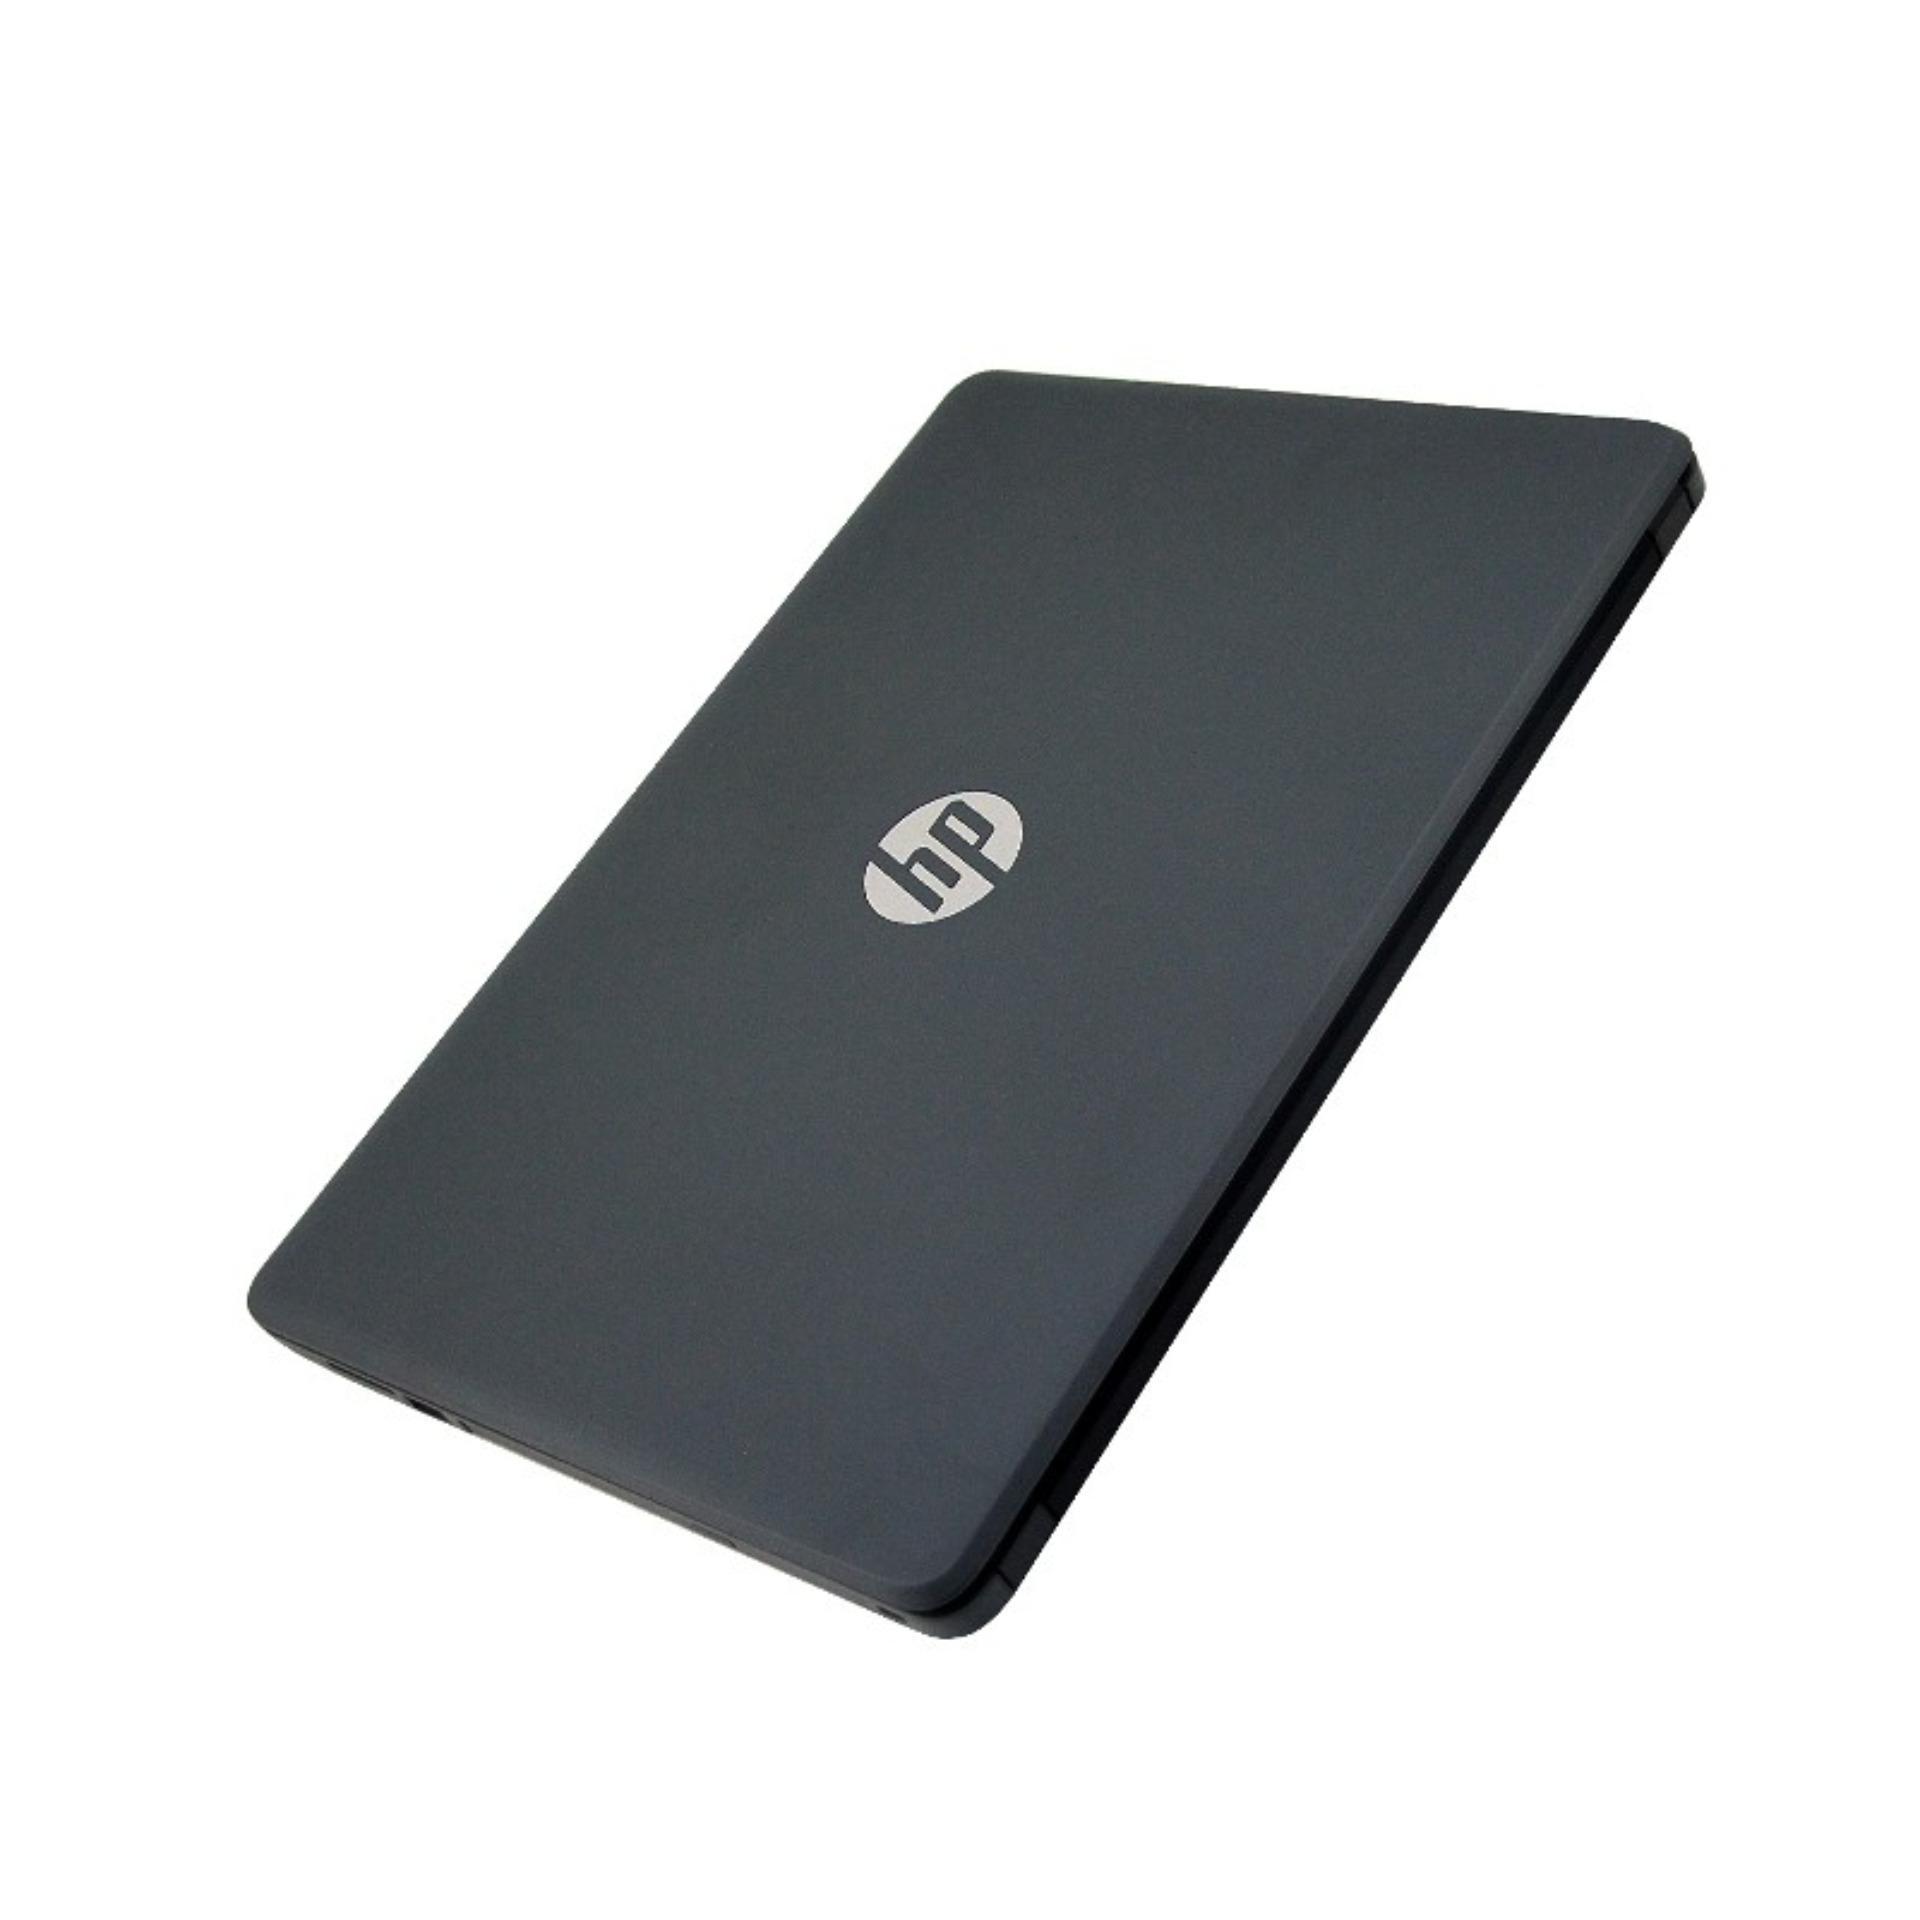 Asus A455la Intel Core I3 5005u 4gb Ram 500gb Hdd Dos 14hd Black6 Pro P2430ua Wo0822d Black 14 Warna